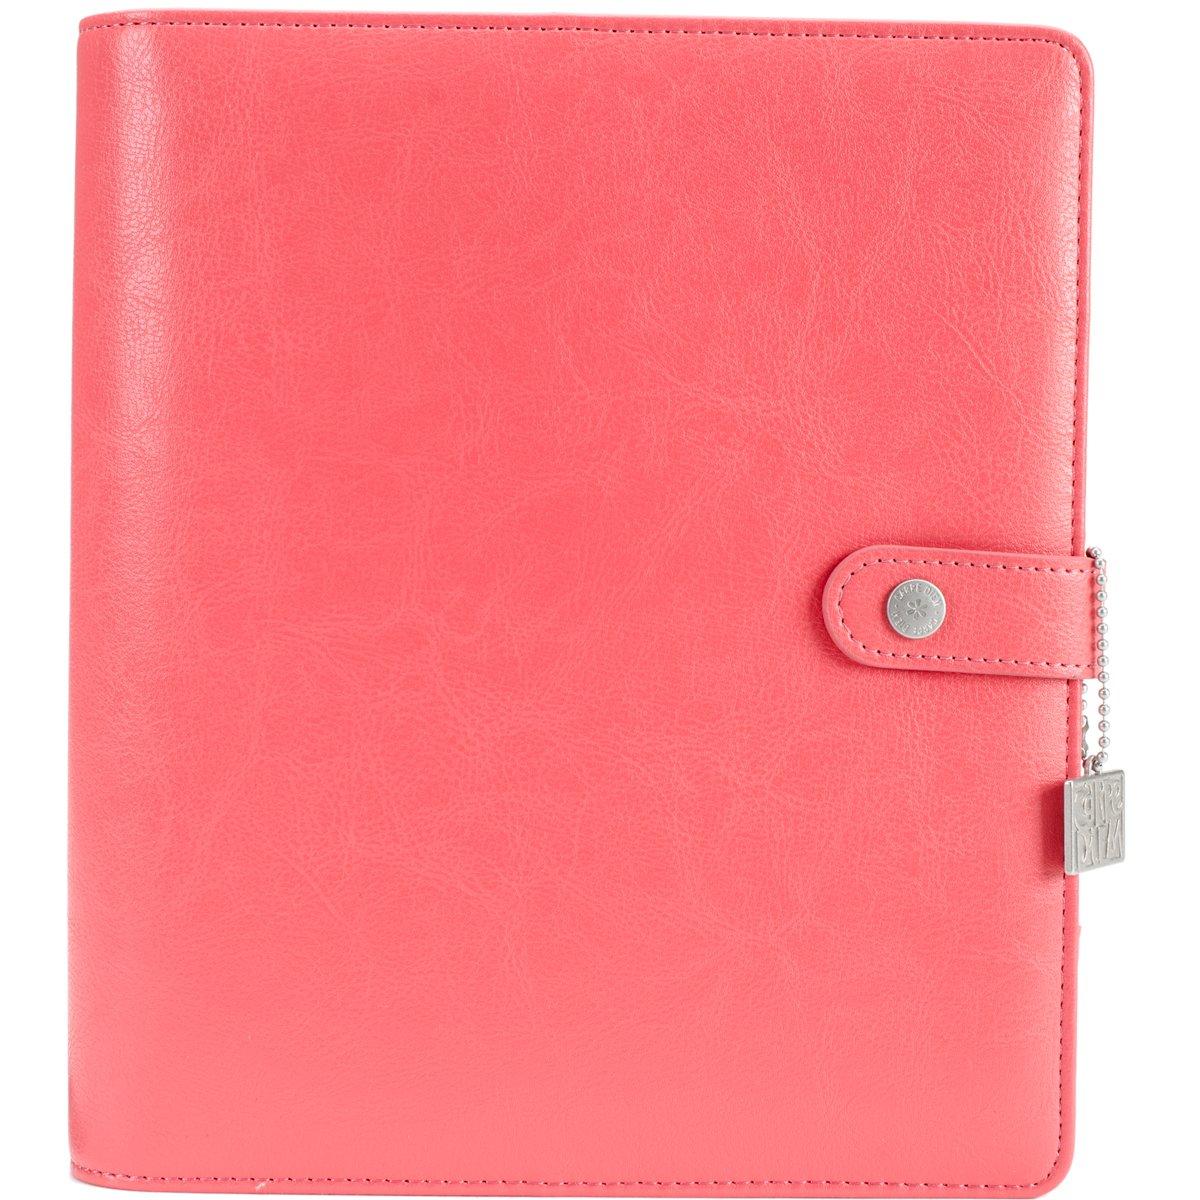 carpe Diem coral Posh planner cofanetto, rosa, A5 Simple Stories 4932